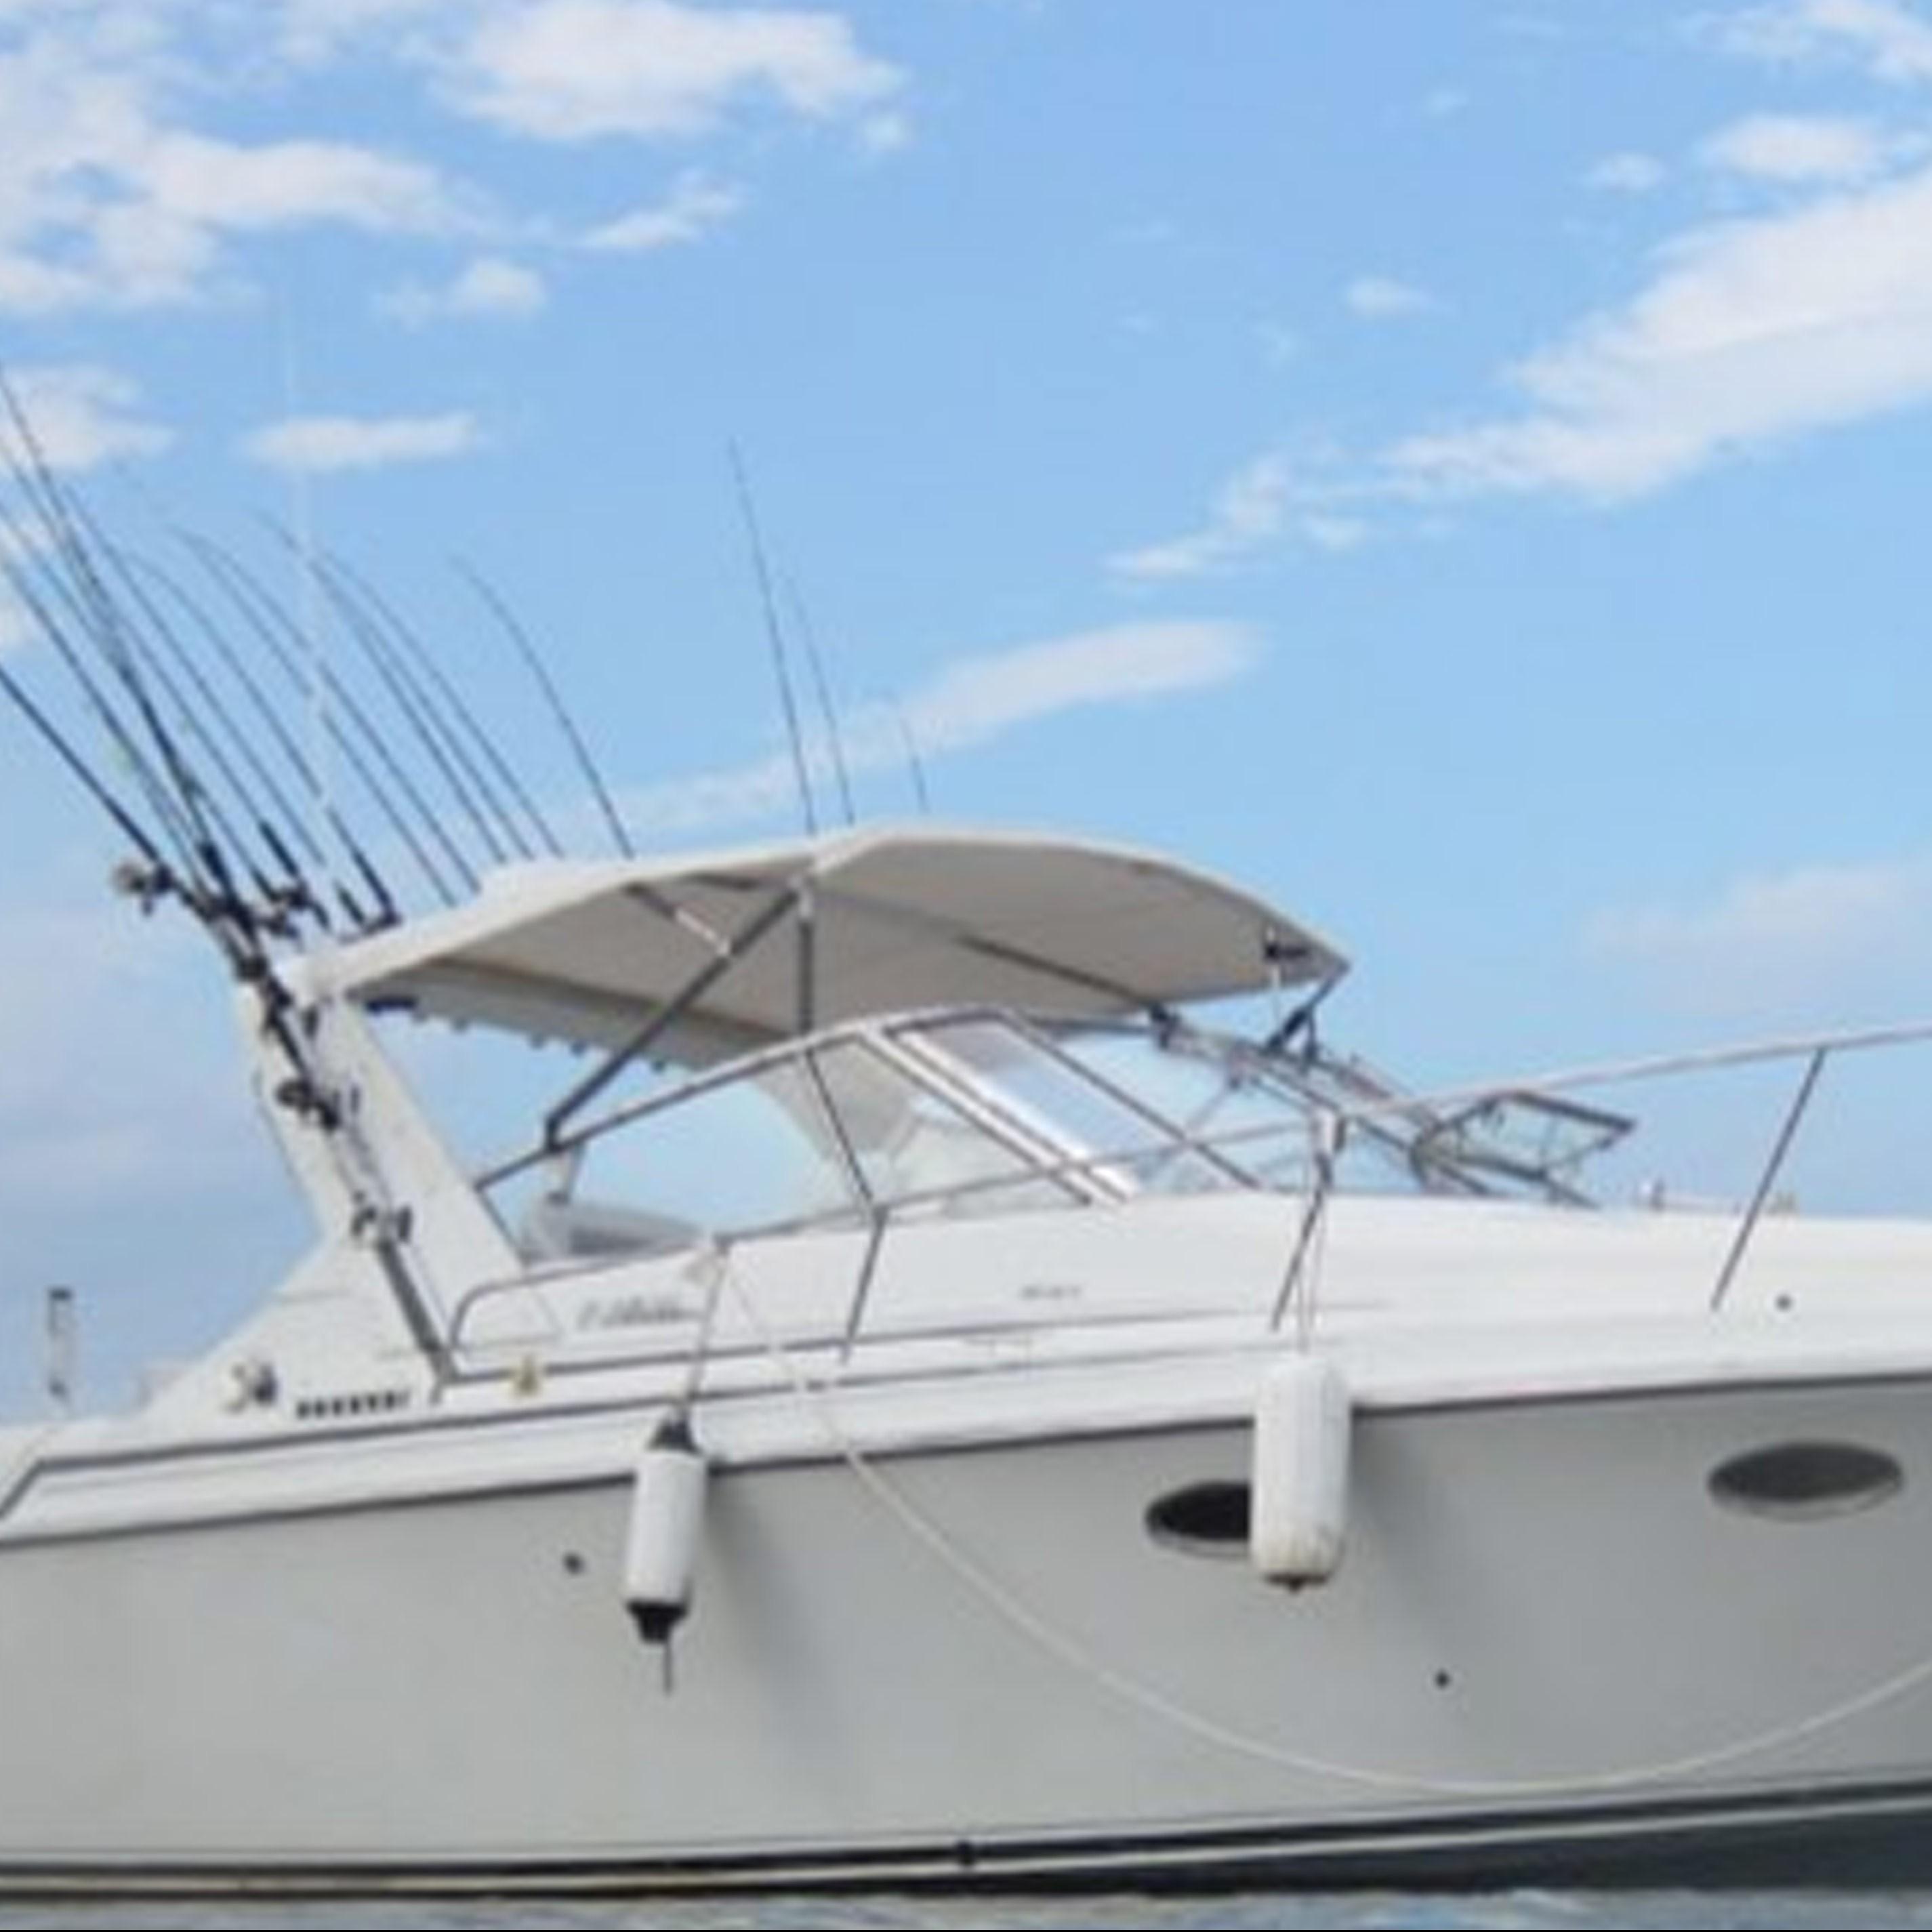 Superior sport fishing lake superior fishing charter for Lake superior fishing charters